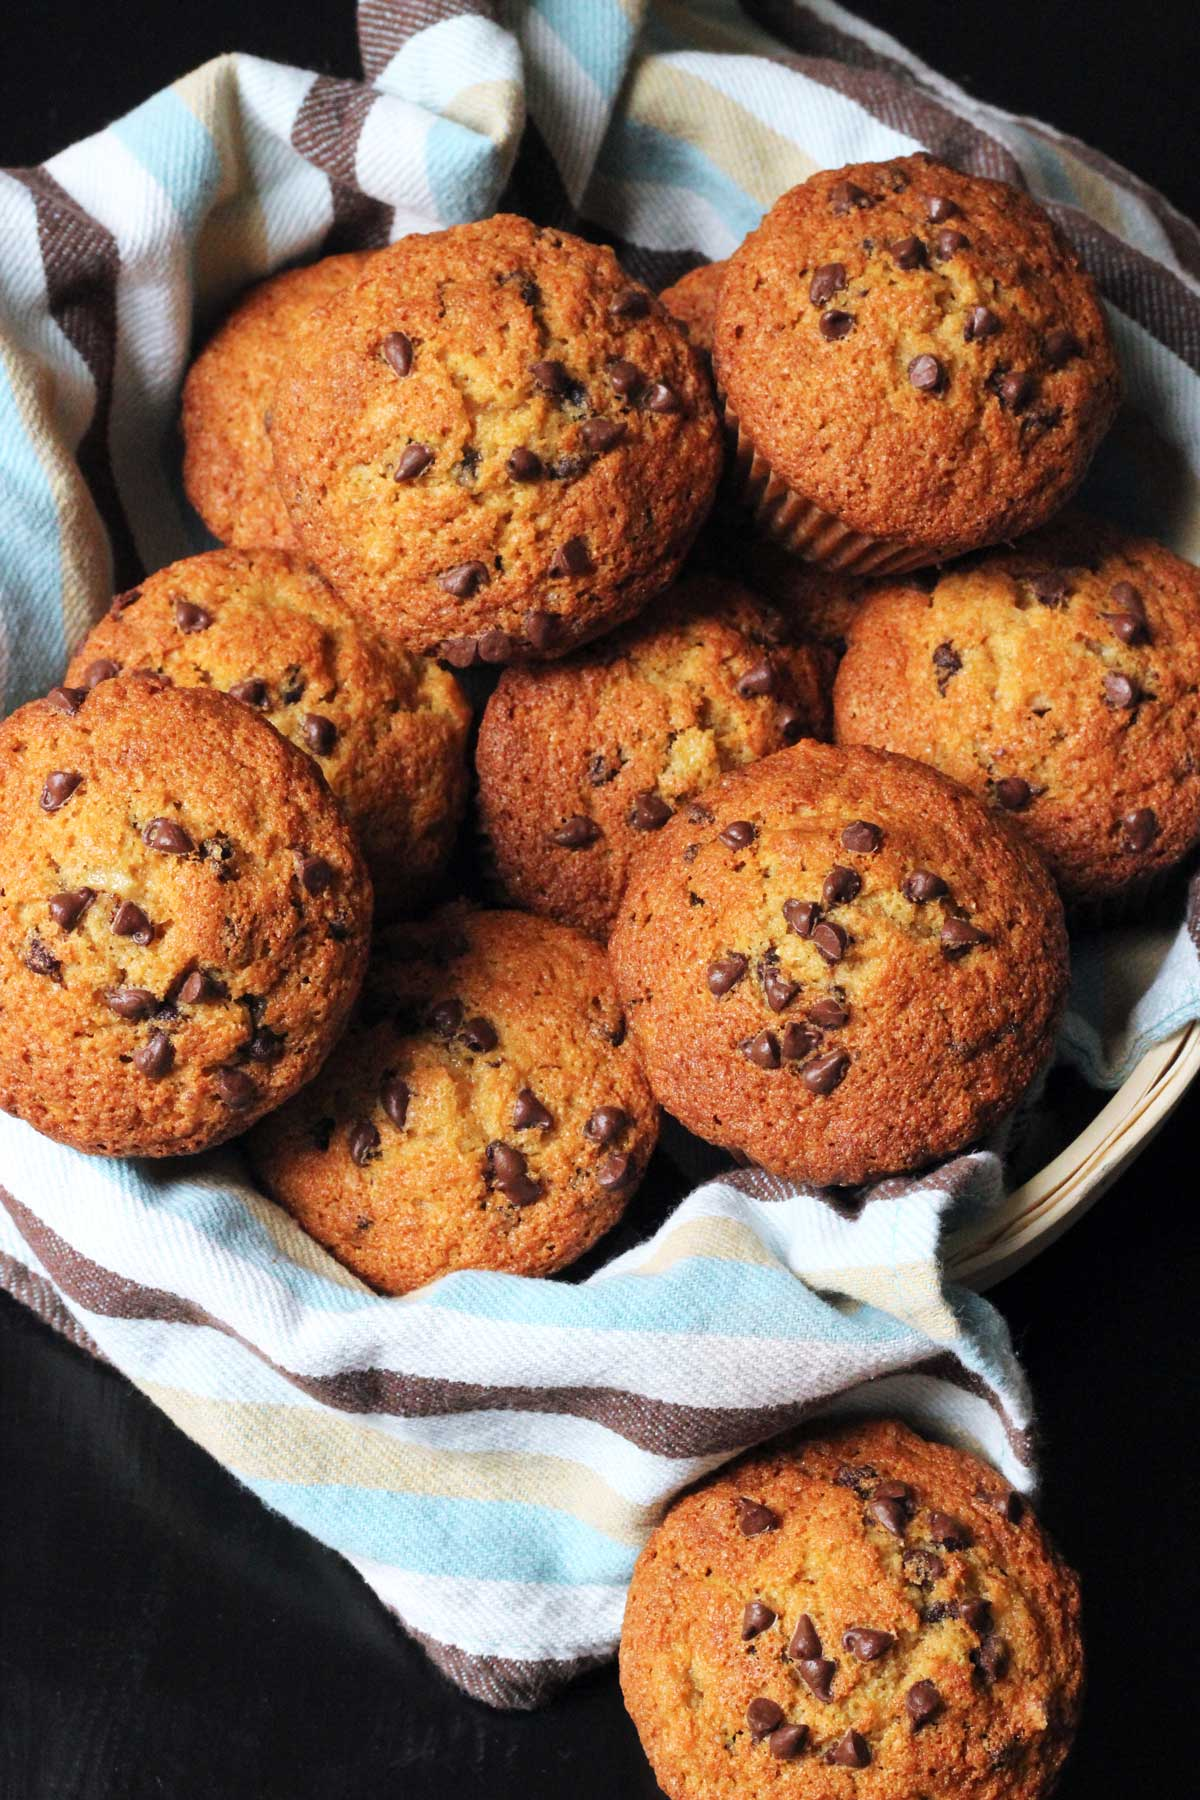 basket of banana chocolate chip muffins